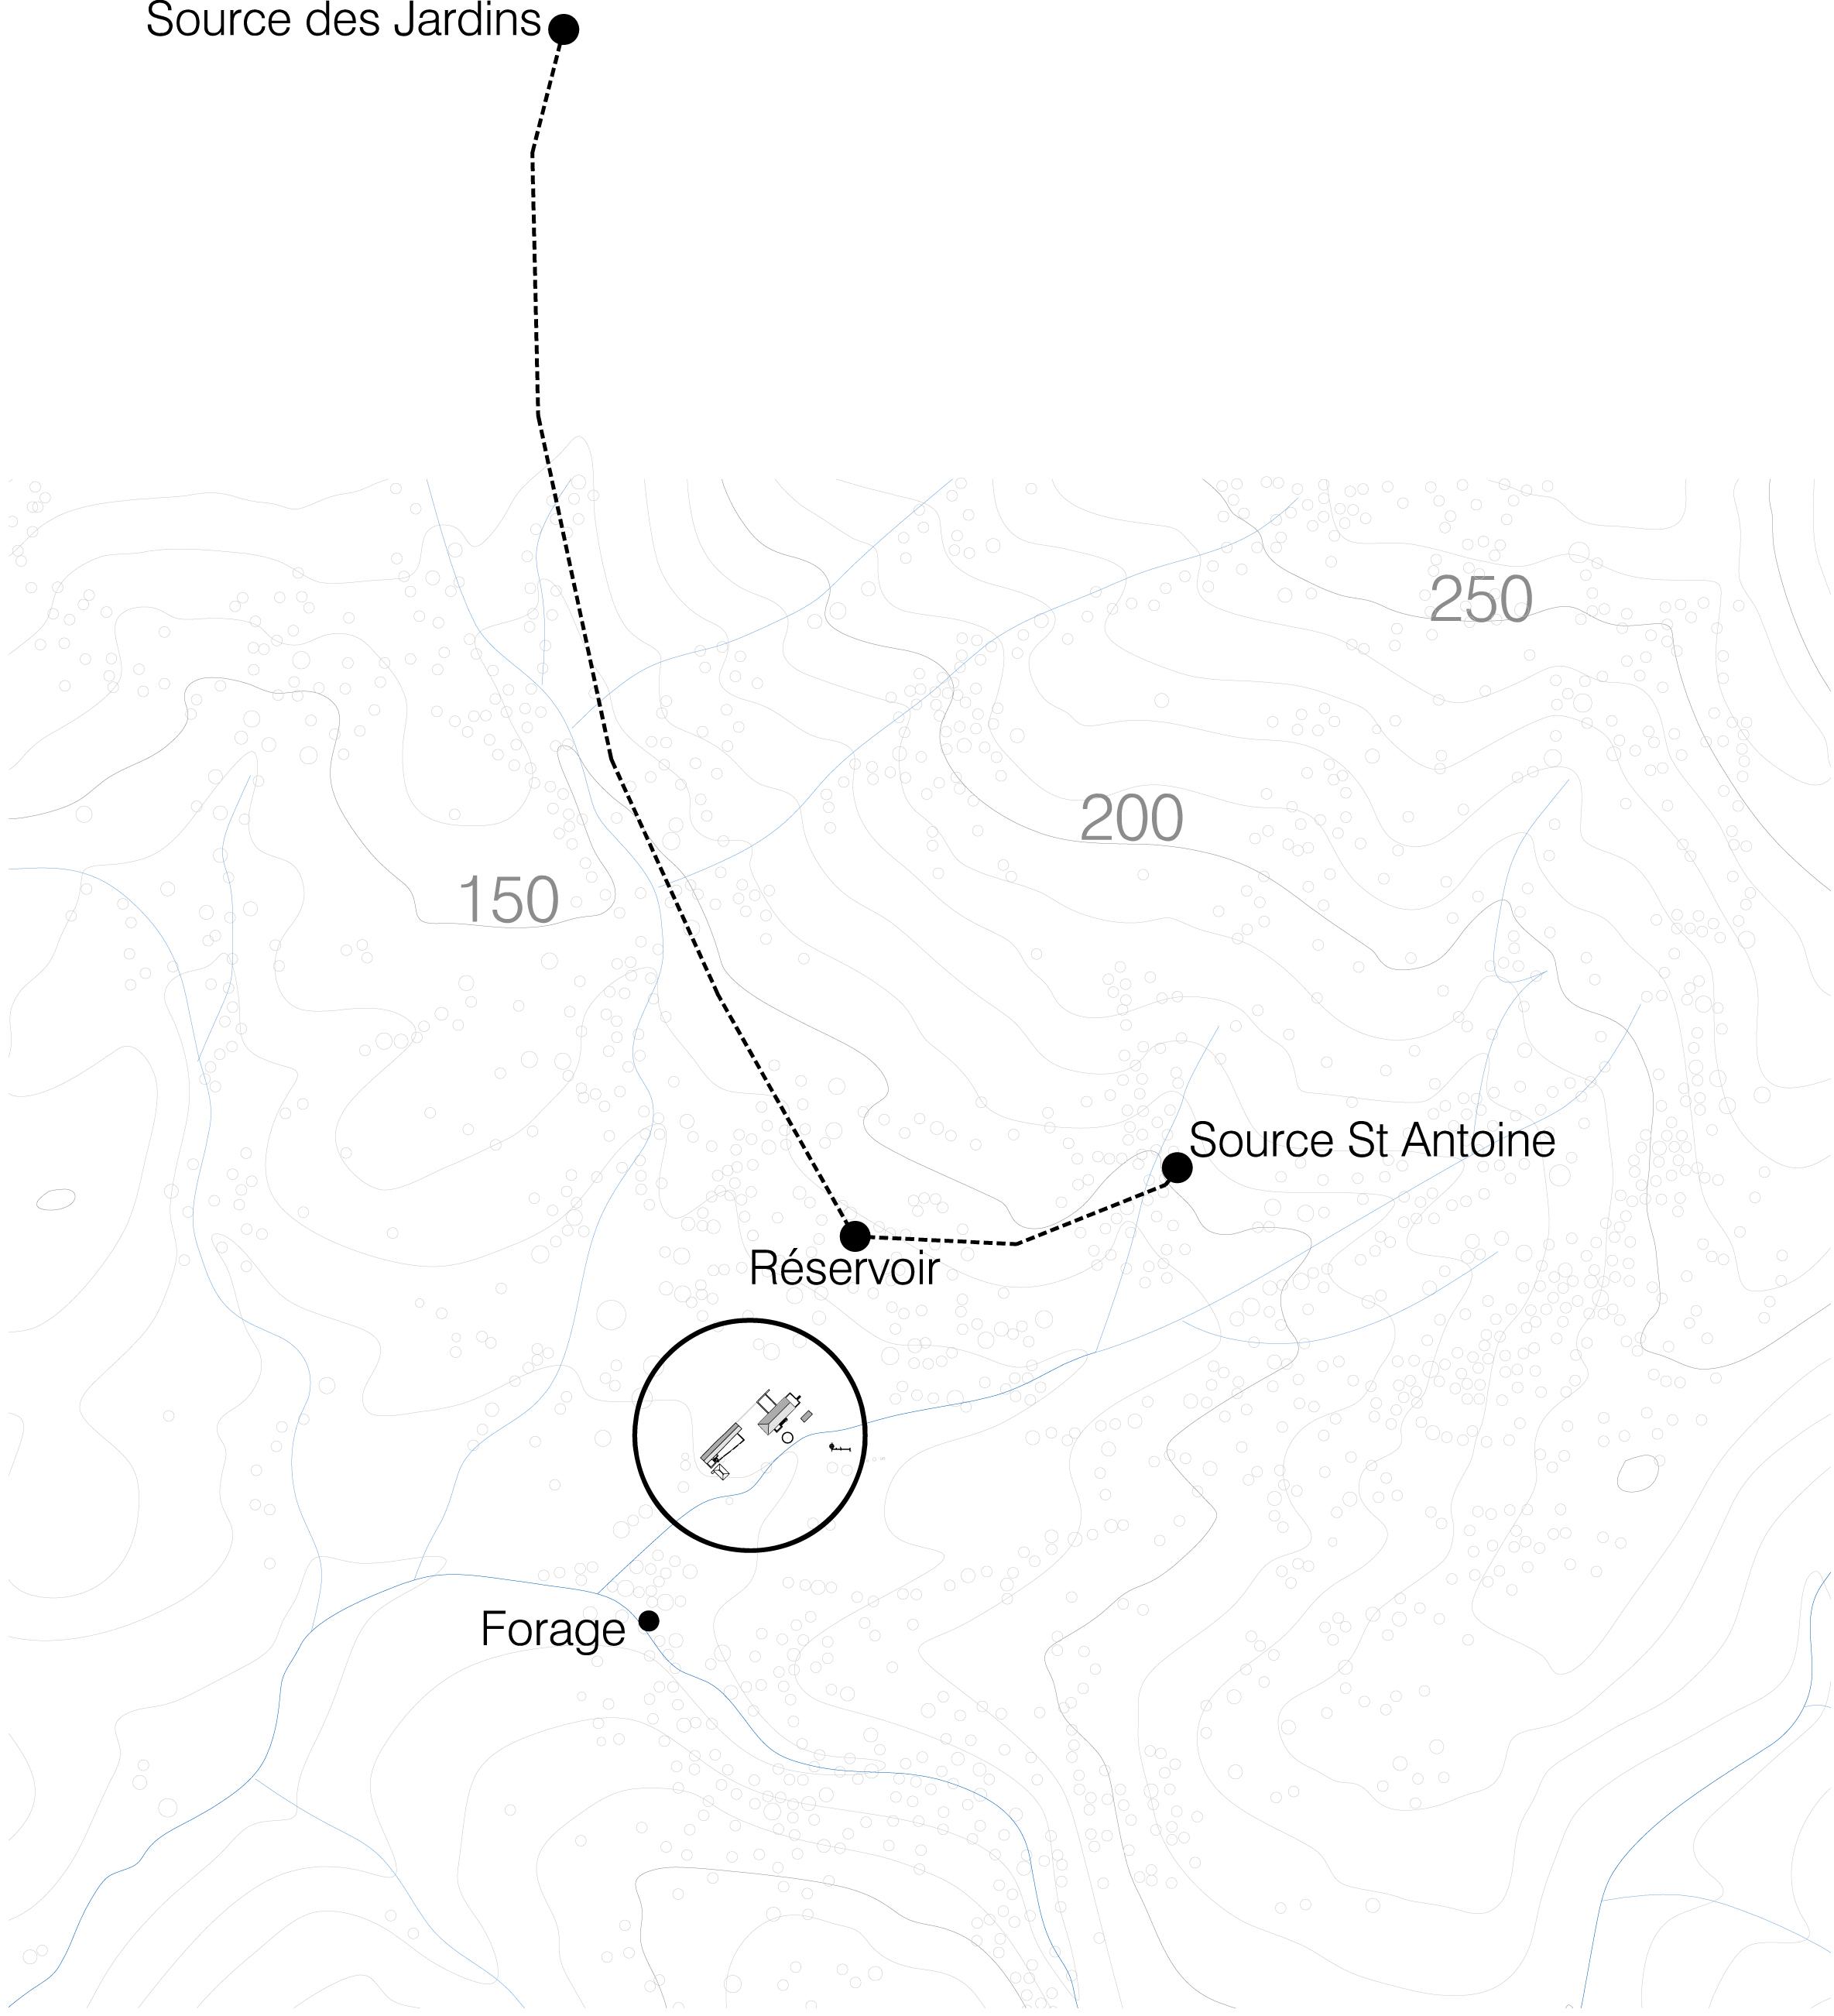 1202-IFANA-PDF-Site-Analyse-Sources.jpg